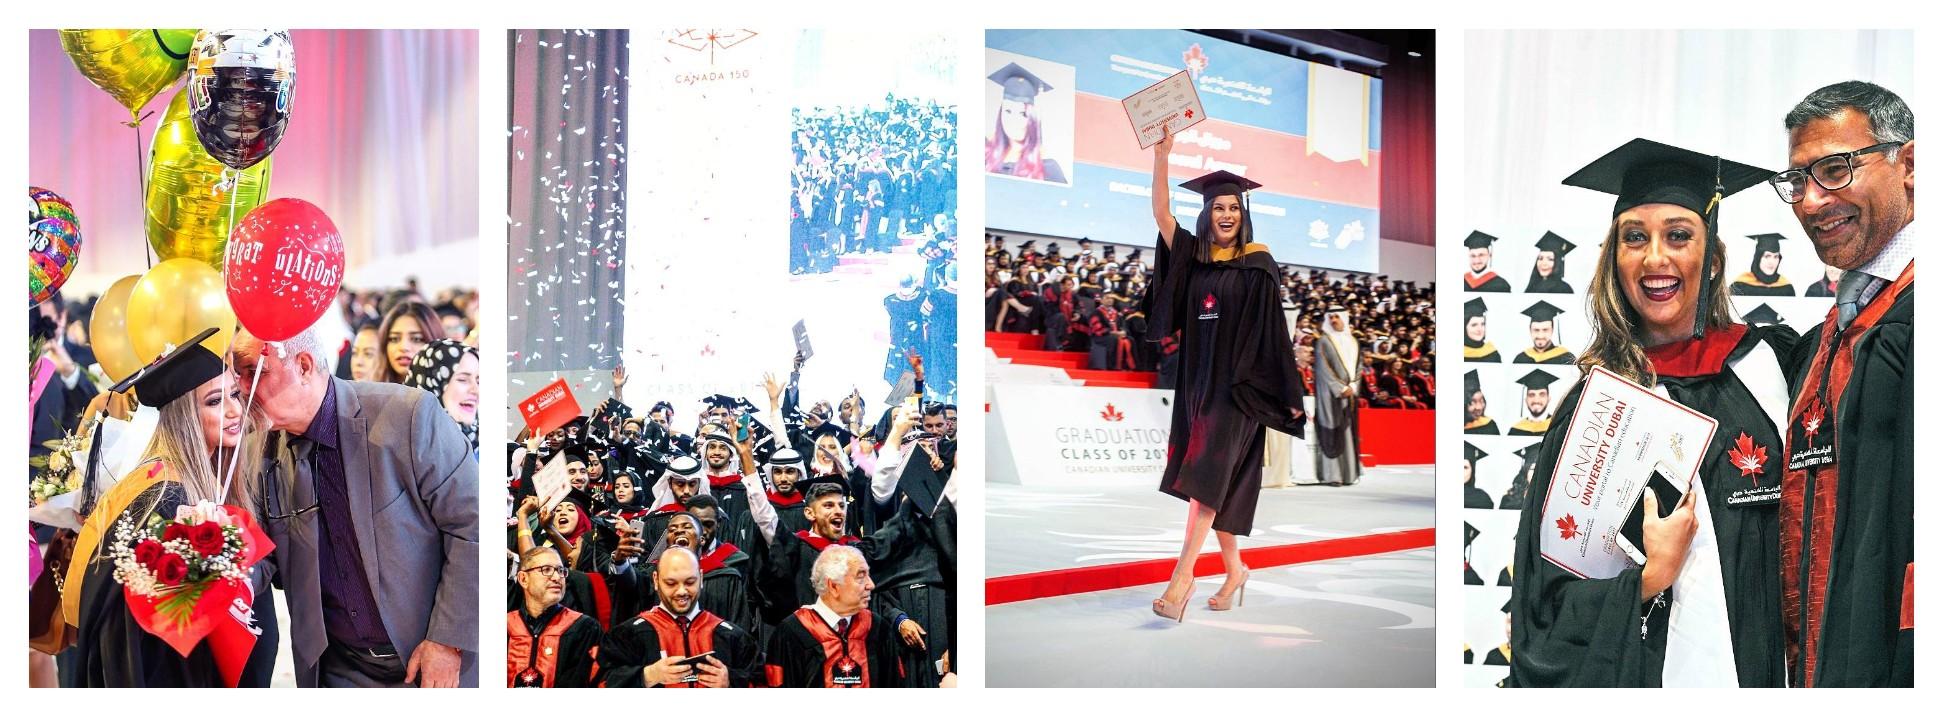 Canadian University Dubai Linkedin